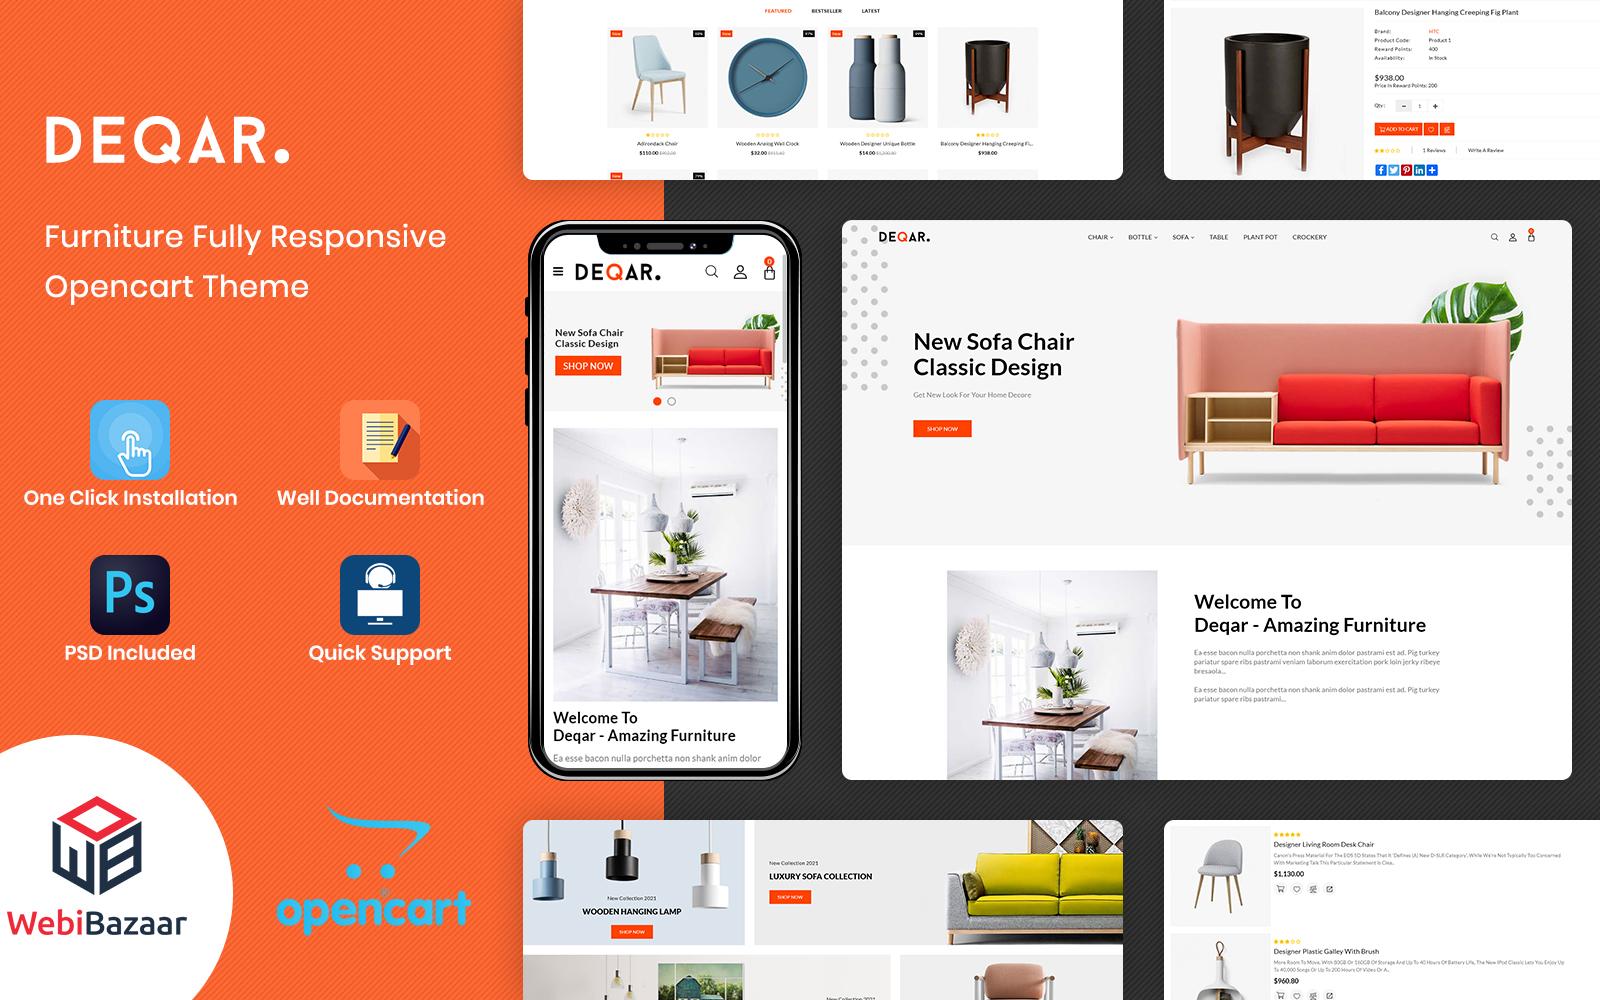 Deqar -  The Furniture Shop Responsive OpenCart Template